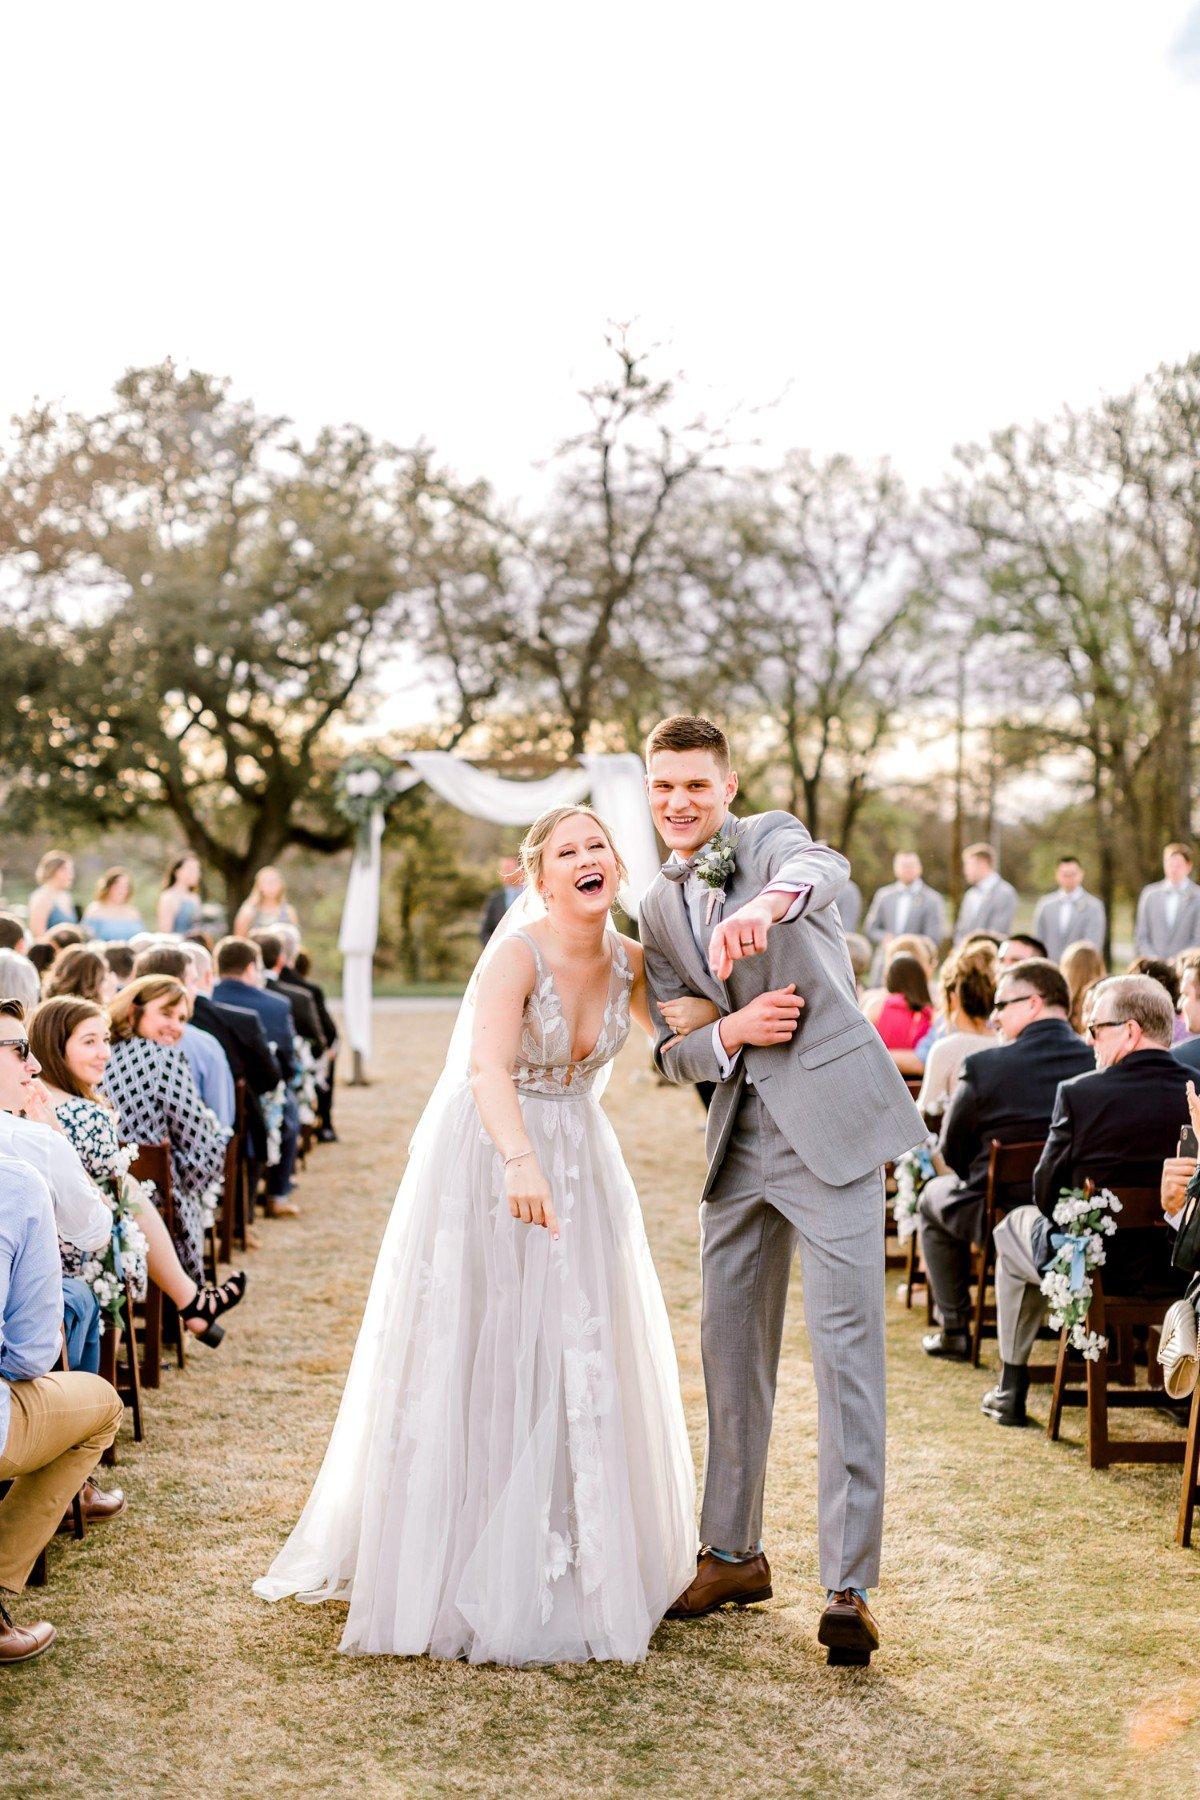 ennis-texas-wedding-photographer-kaitlyn-bullard-80.jpg